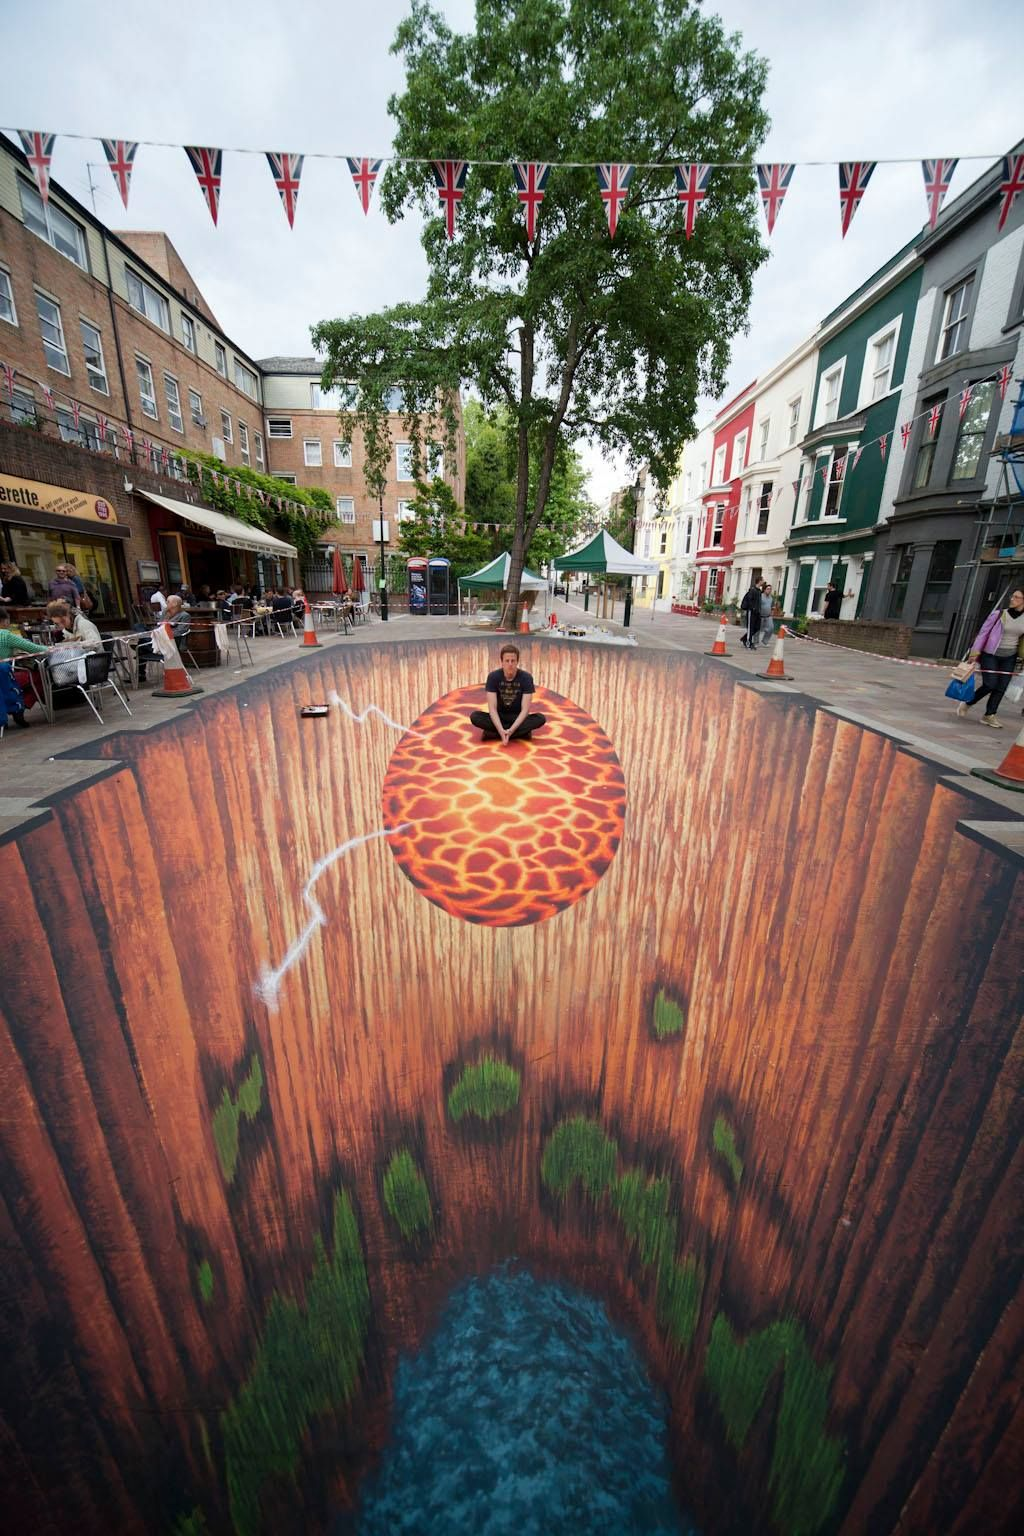 20 amazing 3d street art illusions that will play tricks